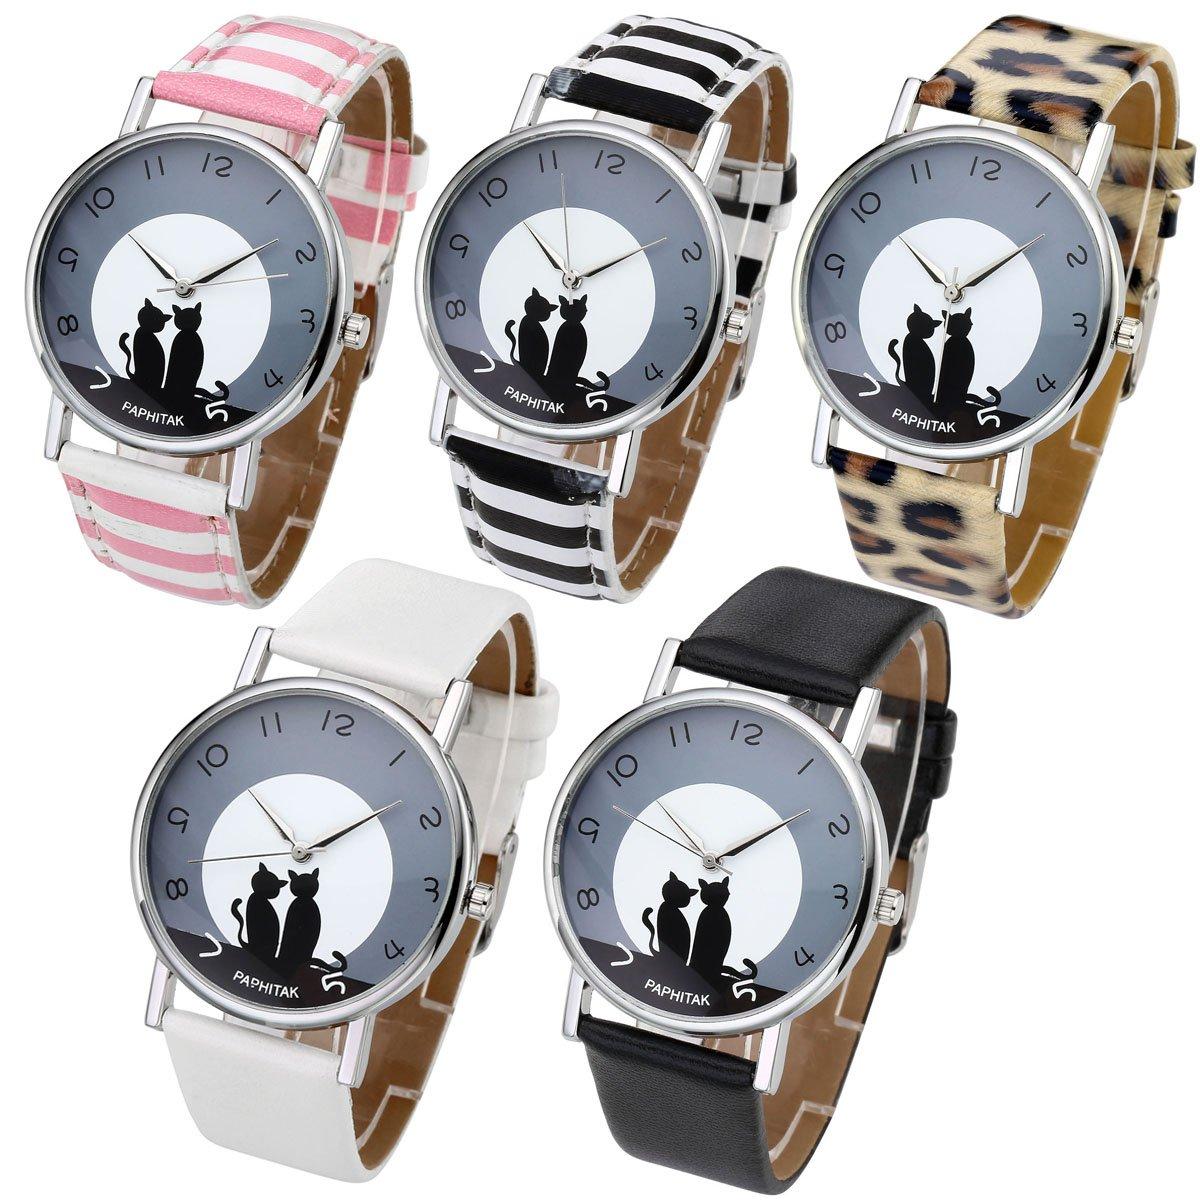 Top Plaza Womens Girls Fashion Cute Cat Pattern Round Dial Quartz Analog Watch 3ATM Waterproof-Set of 5